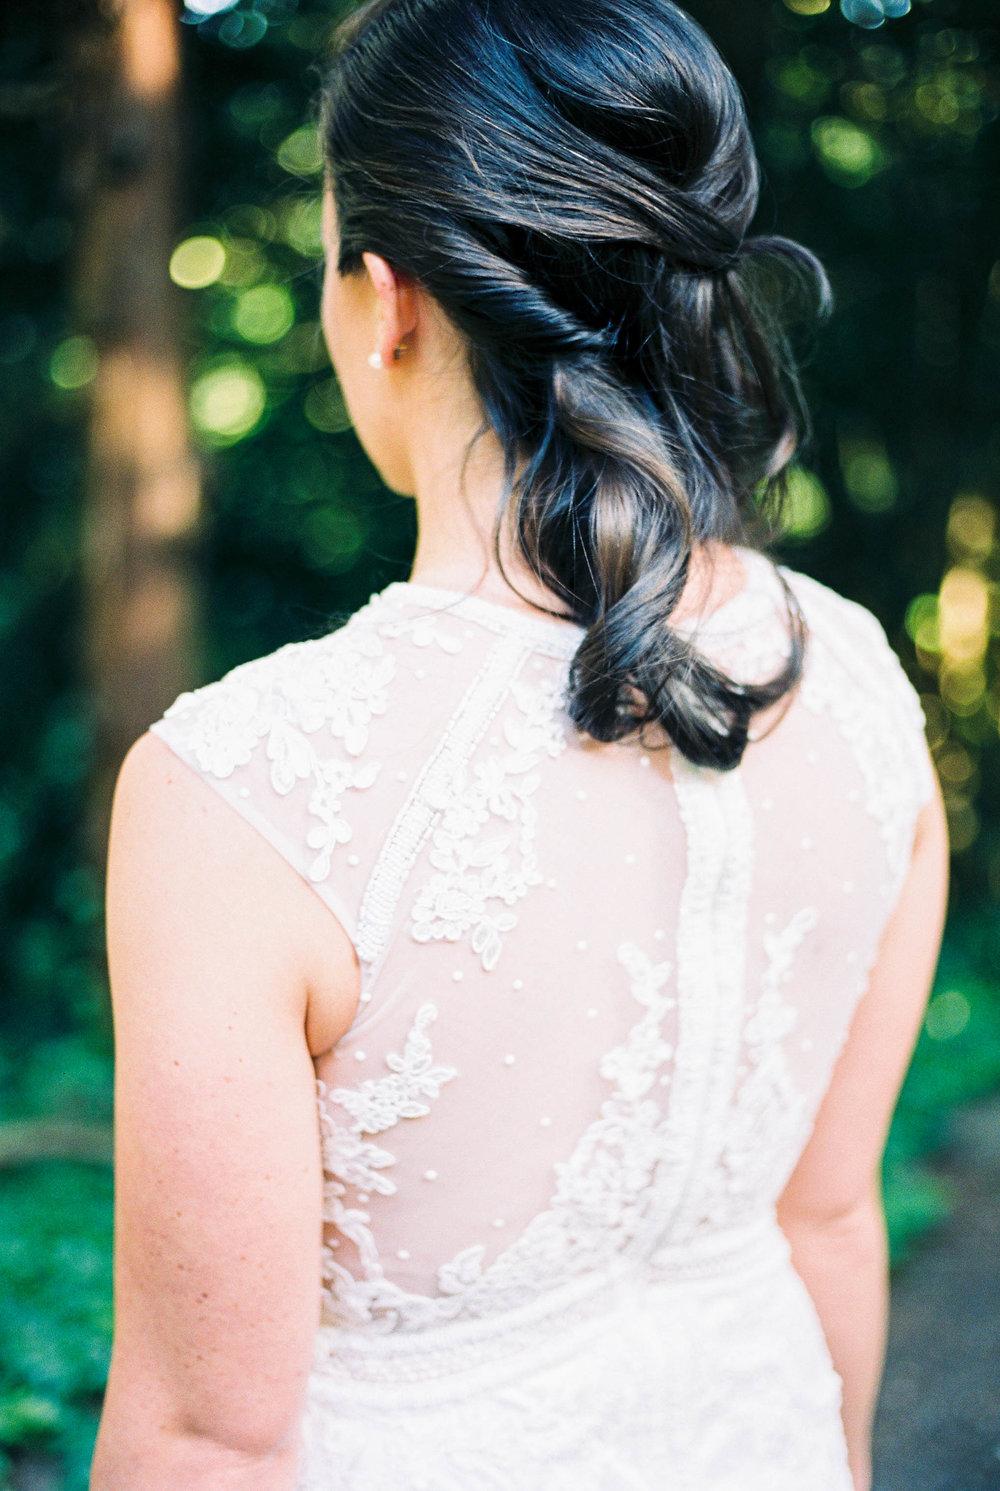 Wedding Planner Seattle | Wedding Wise | Kerry Jeanne Photography | JM Cellars Wedding | Wedding half up hairstyle